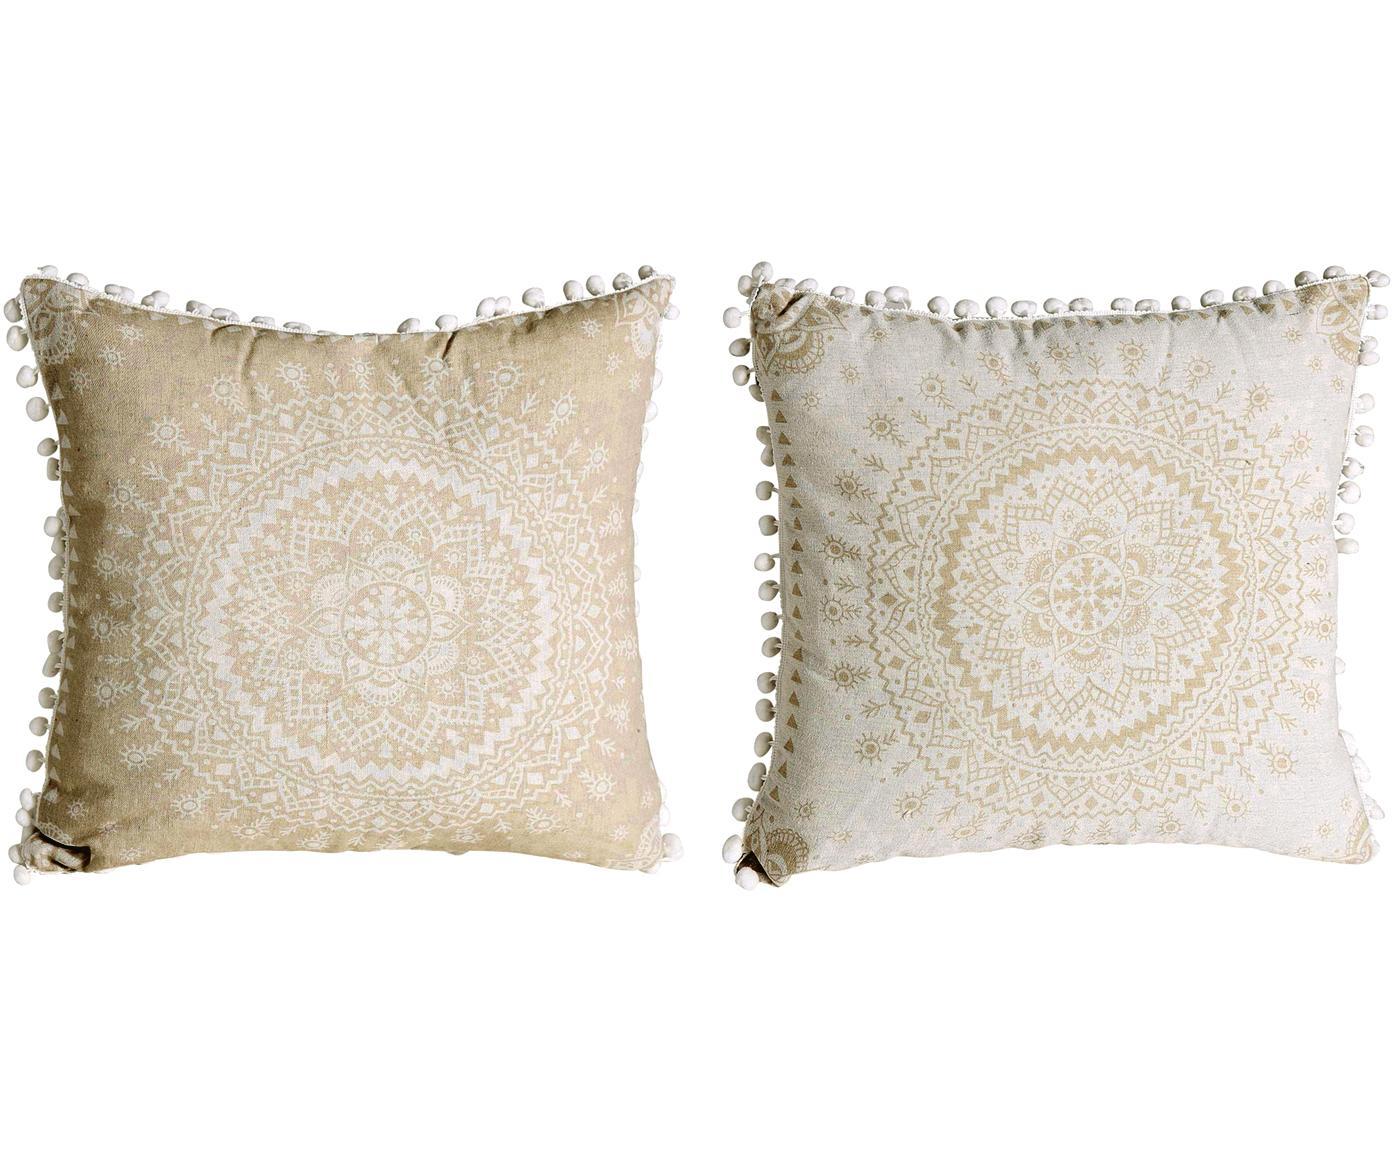 Kussen met patroon Paloma met vulling, 2 stuks, Polyester, Beige, wit, 45 x 45 cm